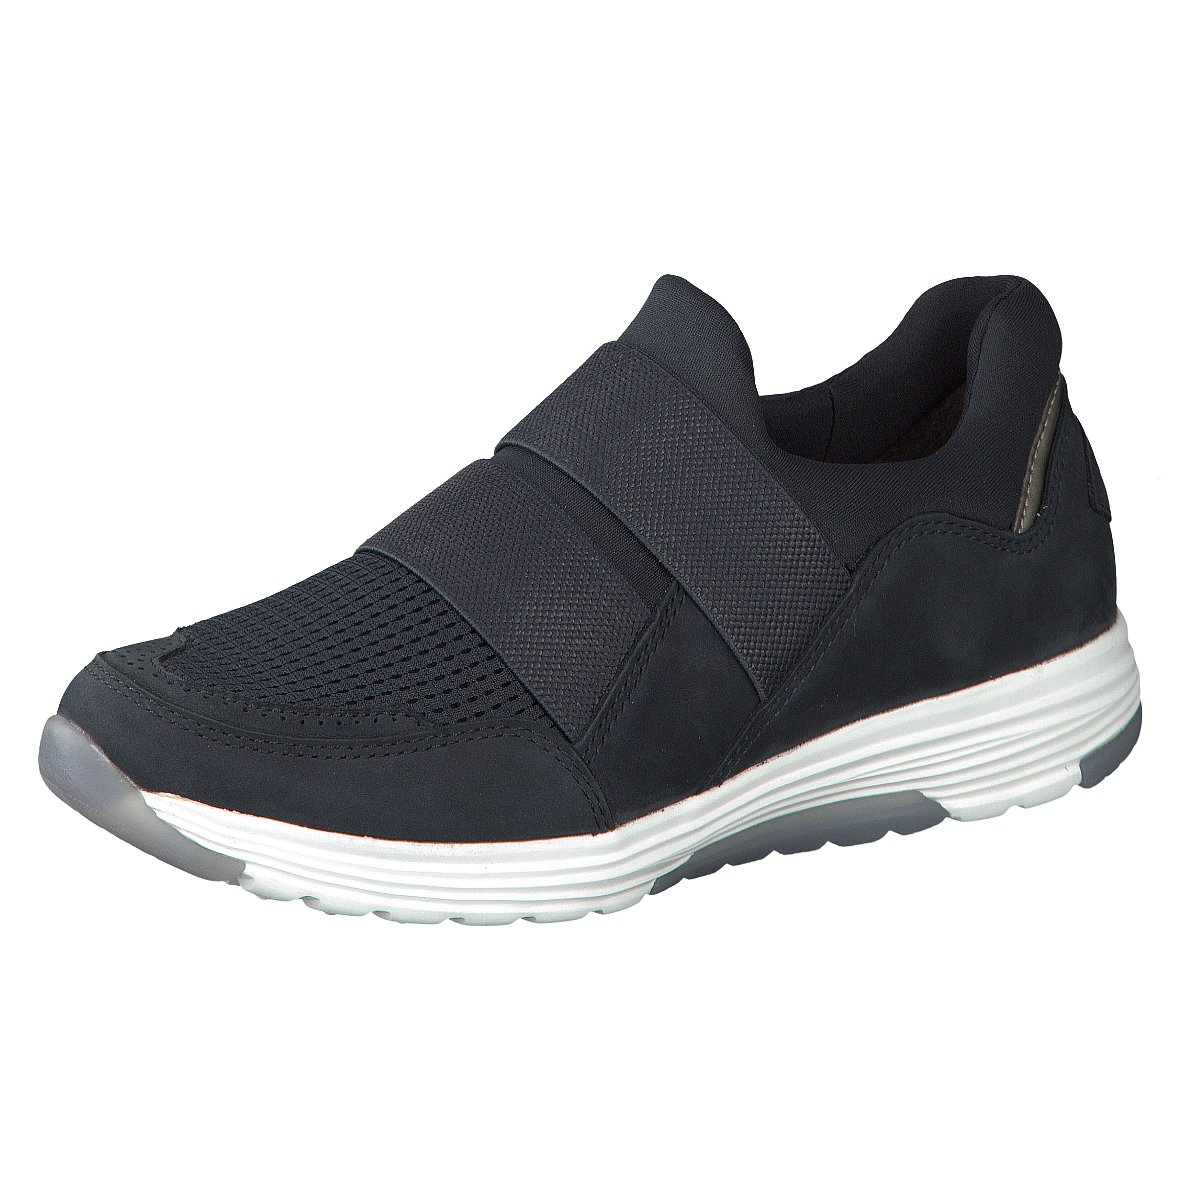 Slipper Damen comfort 66.971.46 Gabor 251493 blau